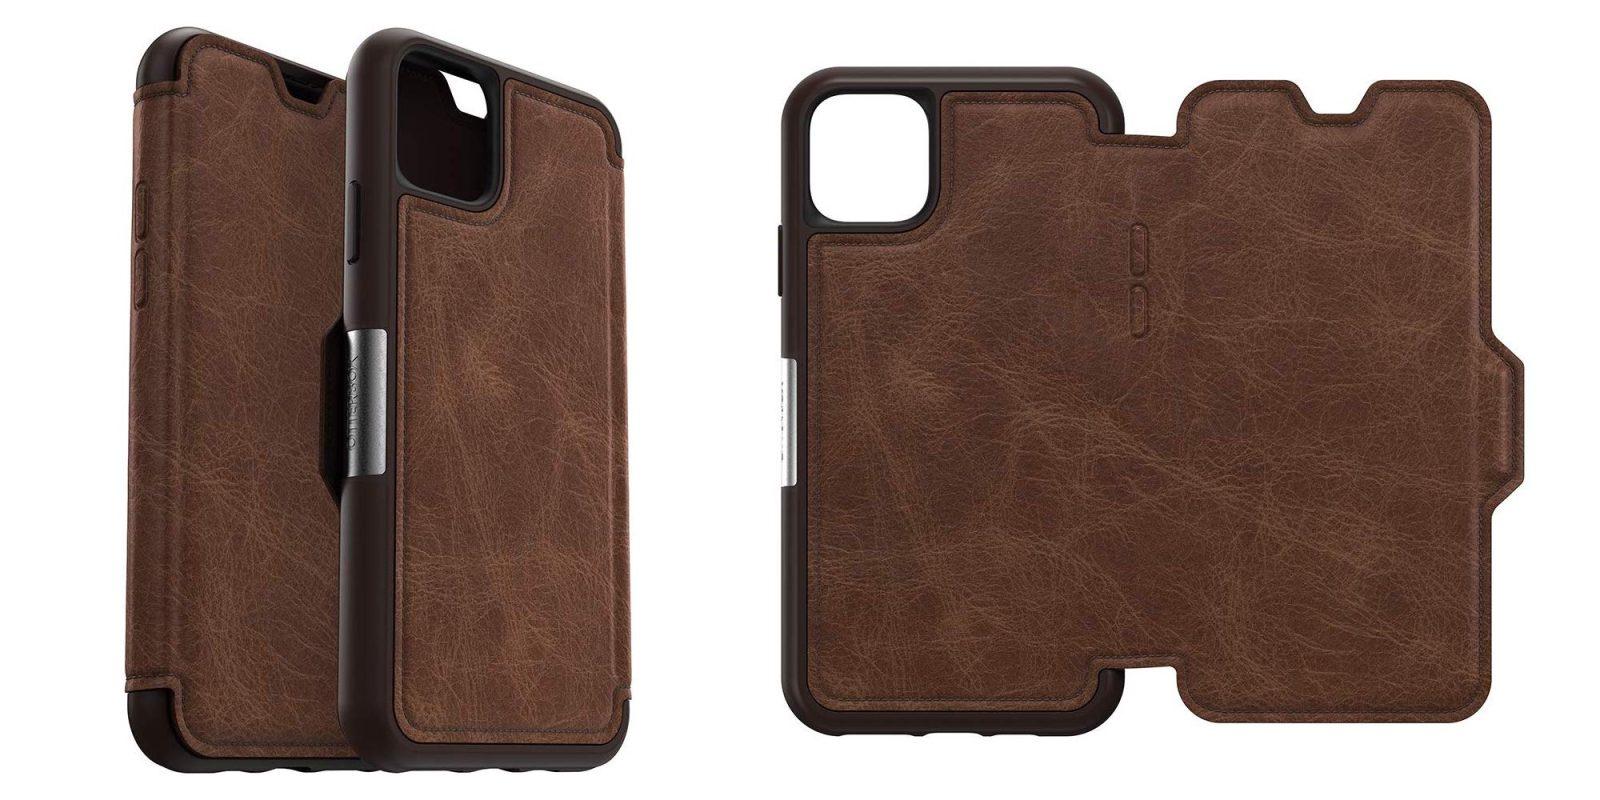 Smartphone Accessories: OtterBox iPhone 11 Pro Max Leather Folio $45, more